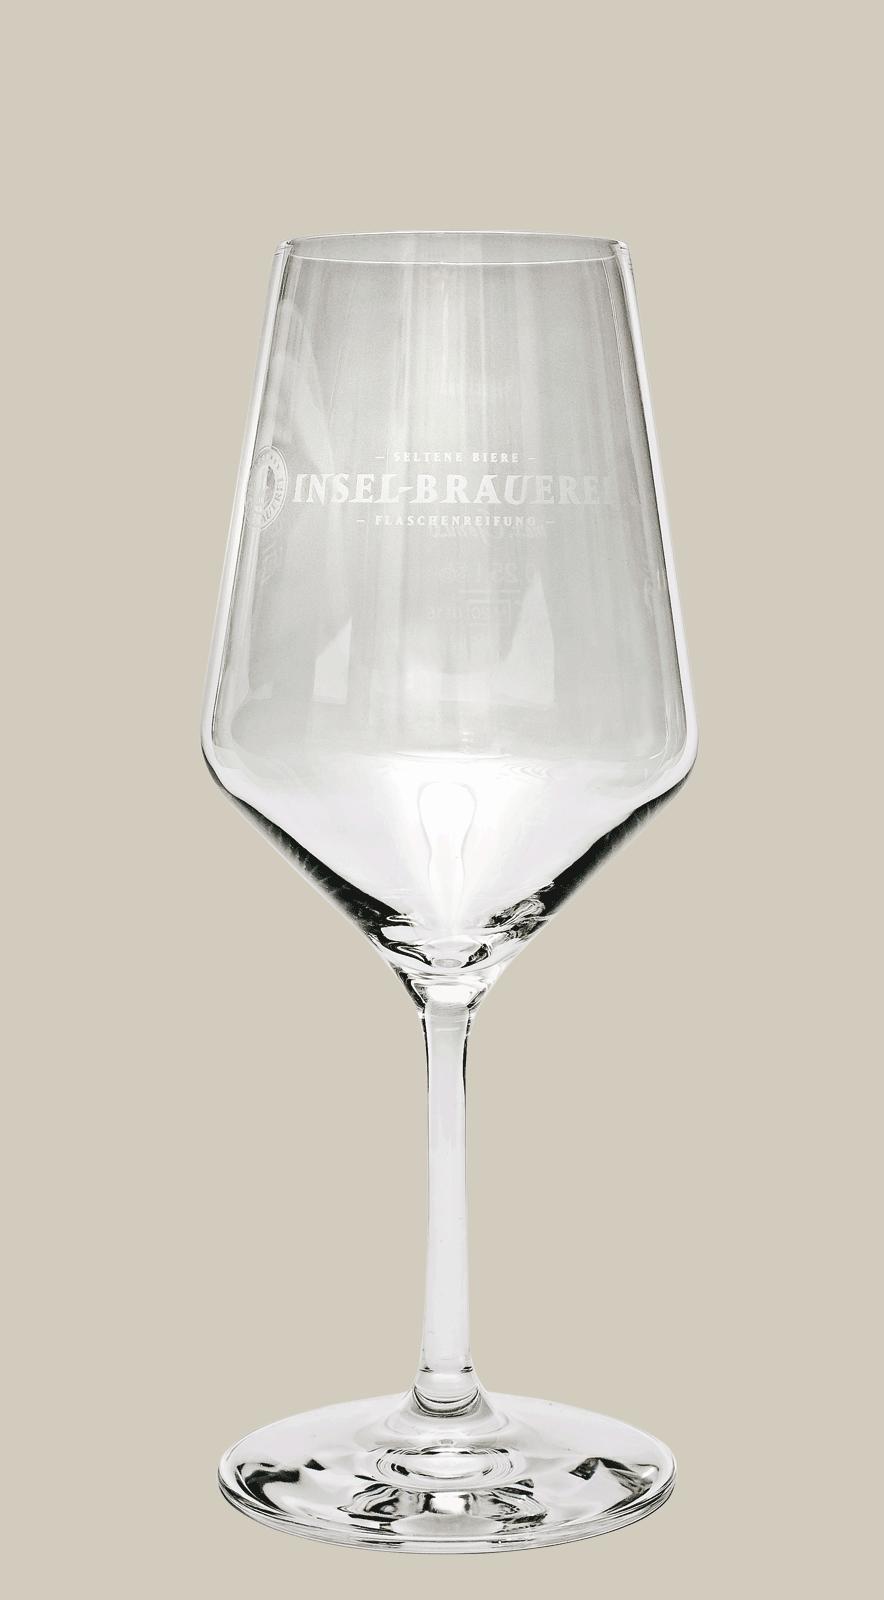 6 x Sommelierglas - Logo Insel-Brauerei